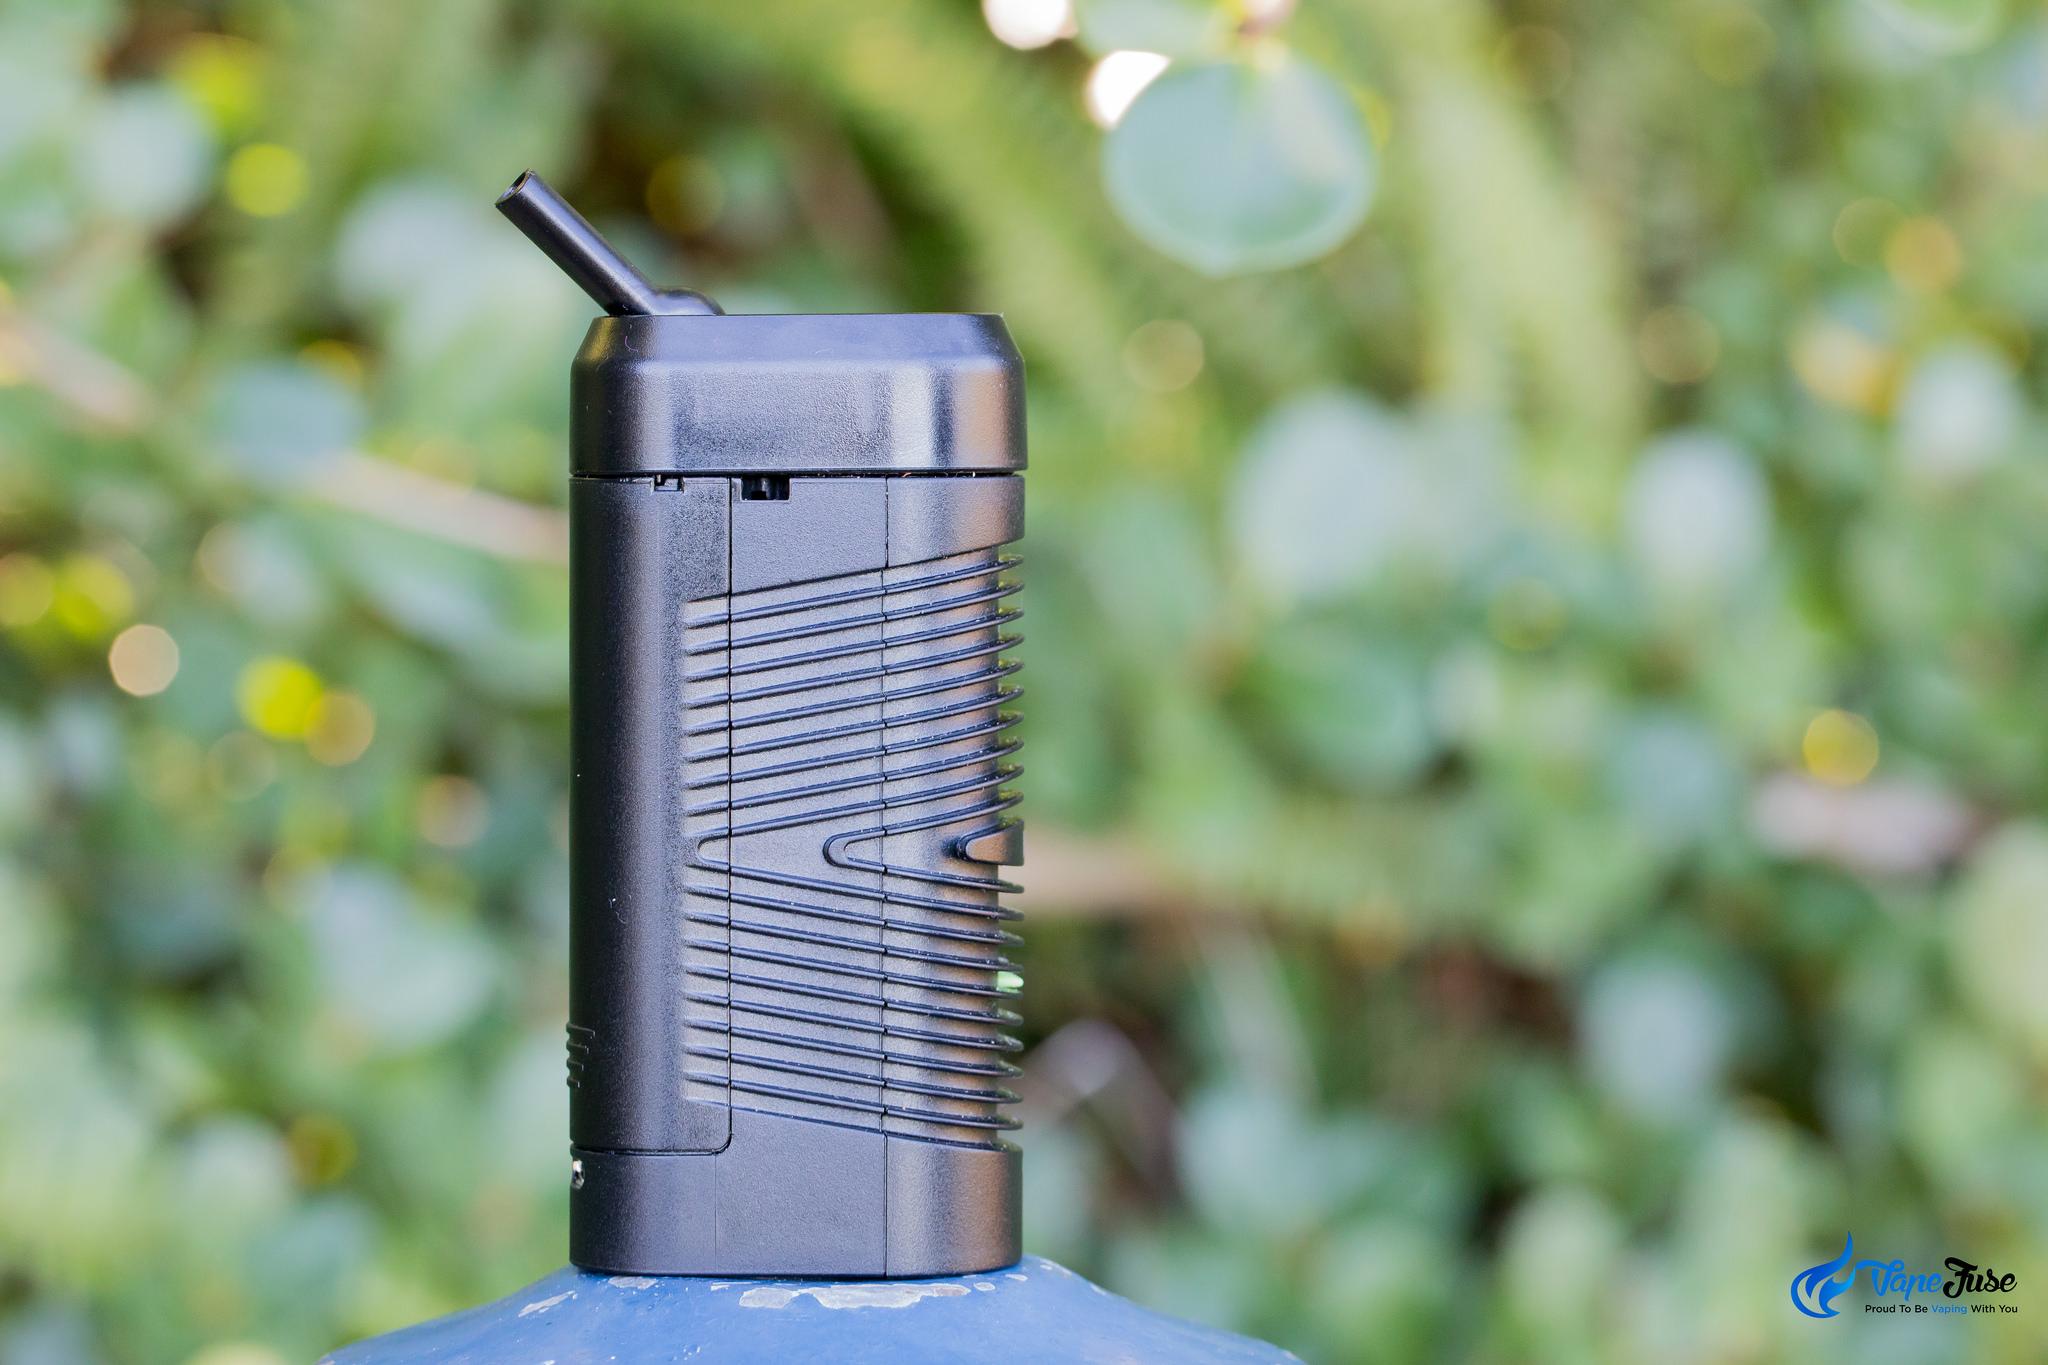 Sneak Peek: Vivant Alternate Portable Vaporizer